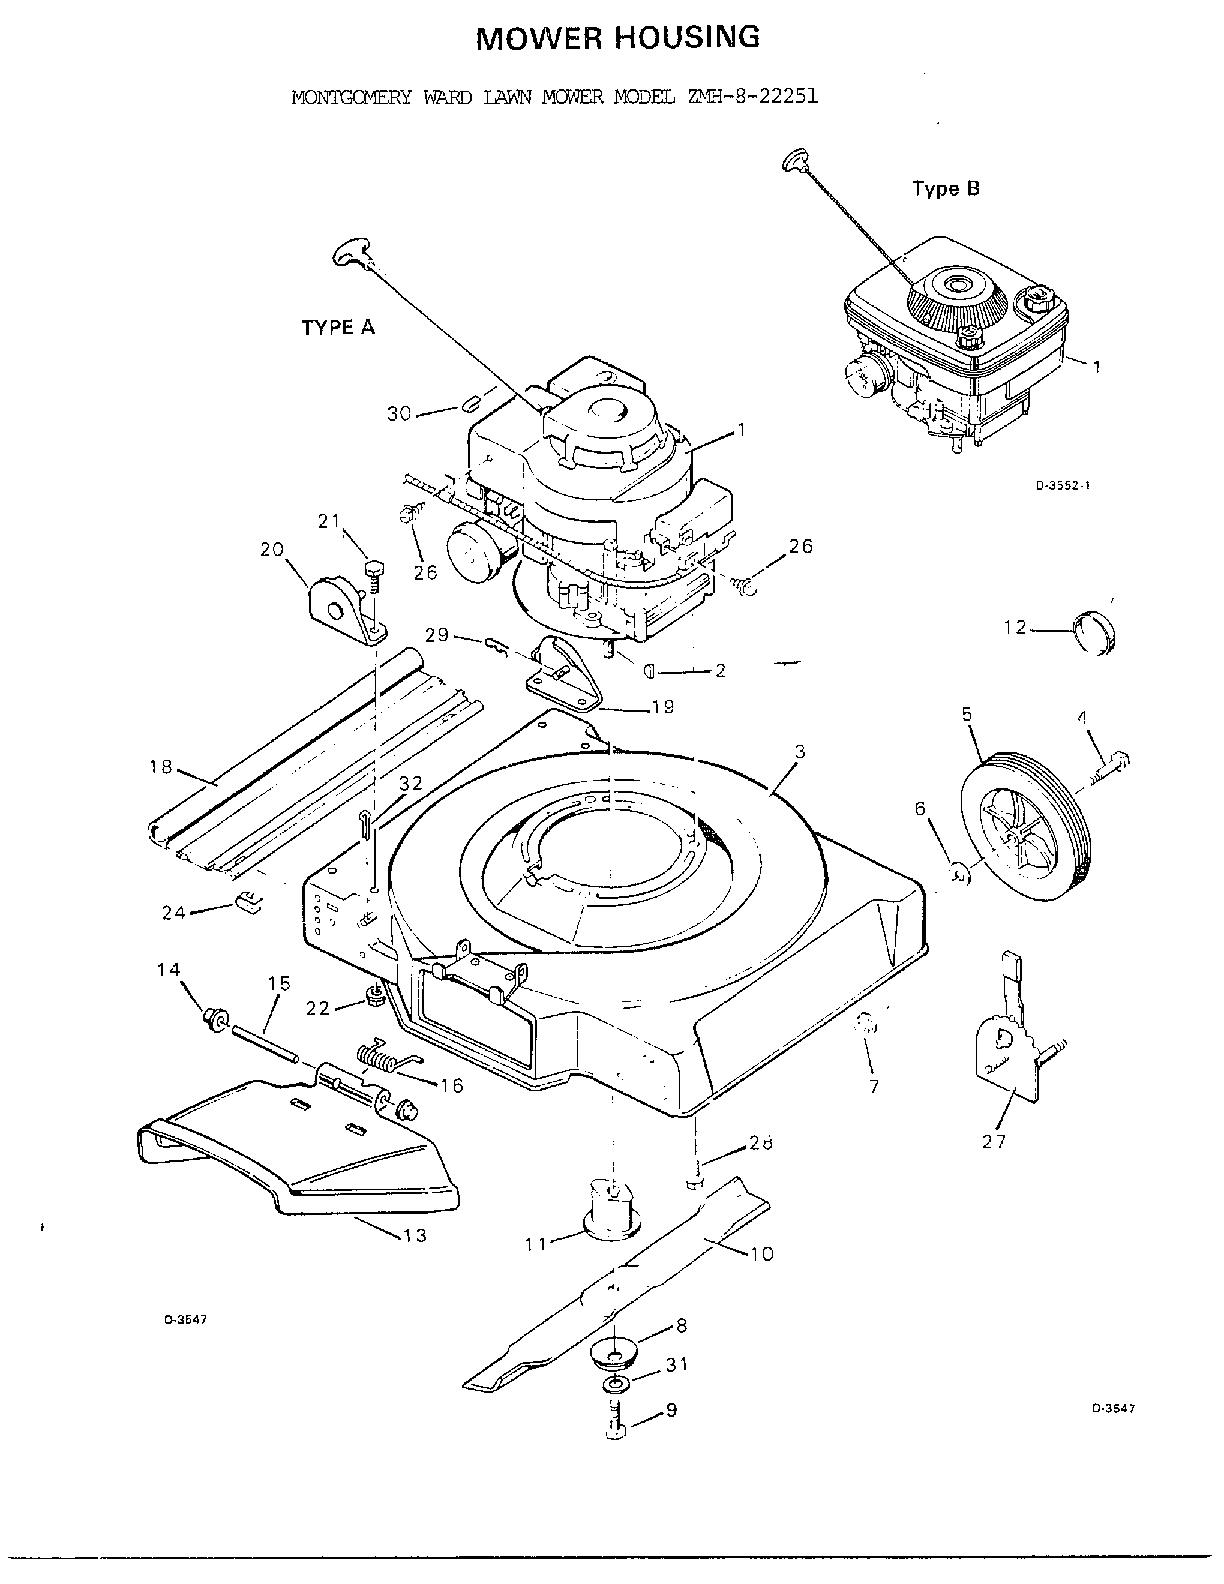 2010 wiring murray diagram 46104x8b